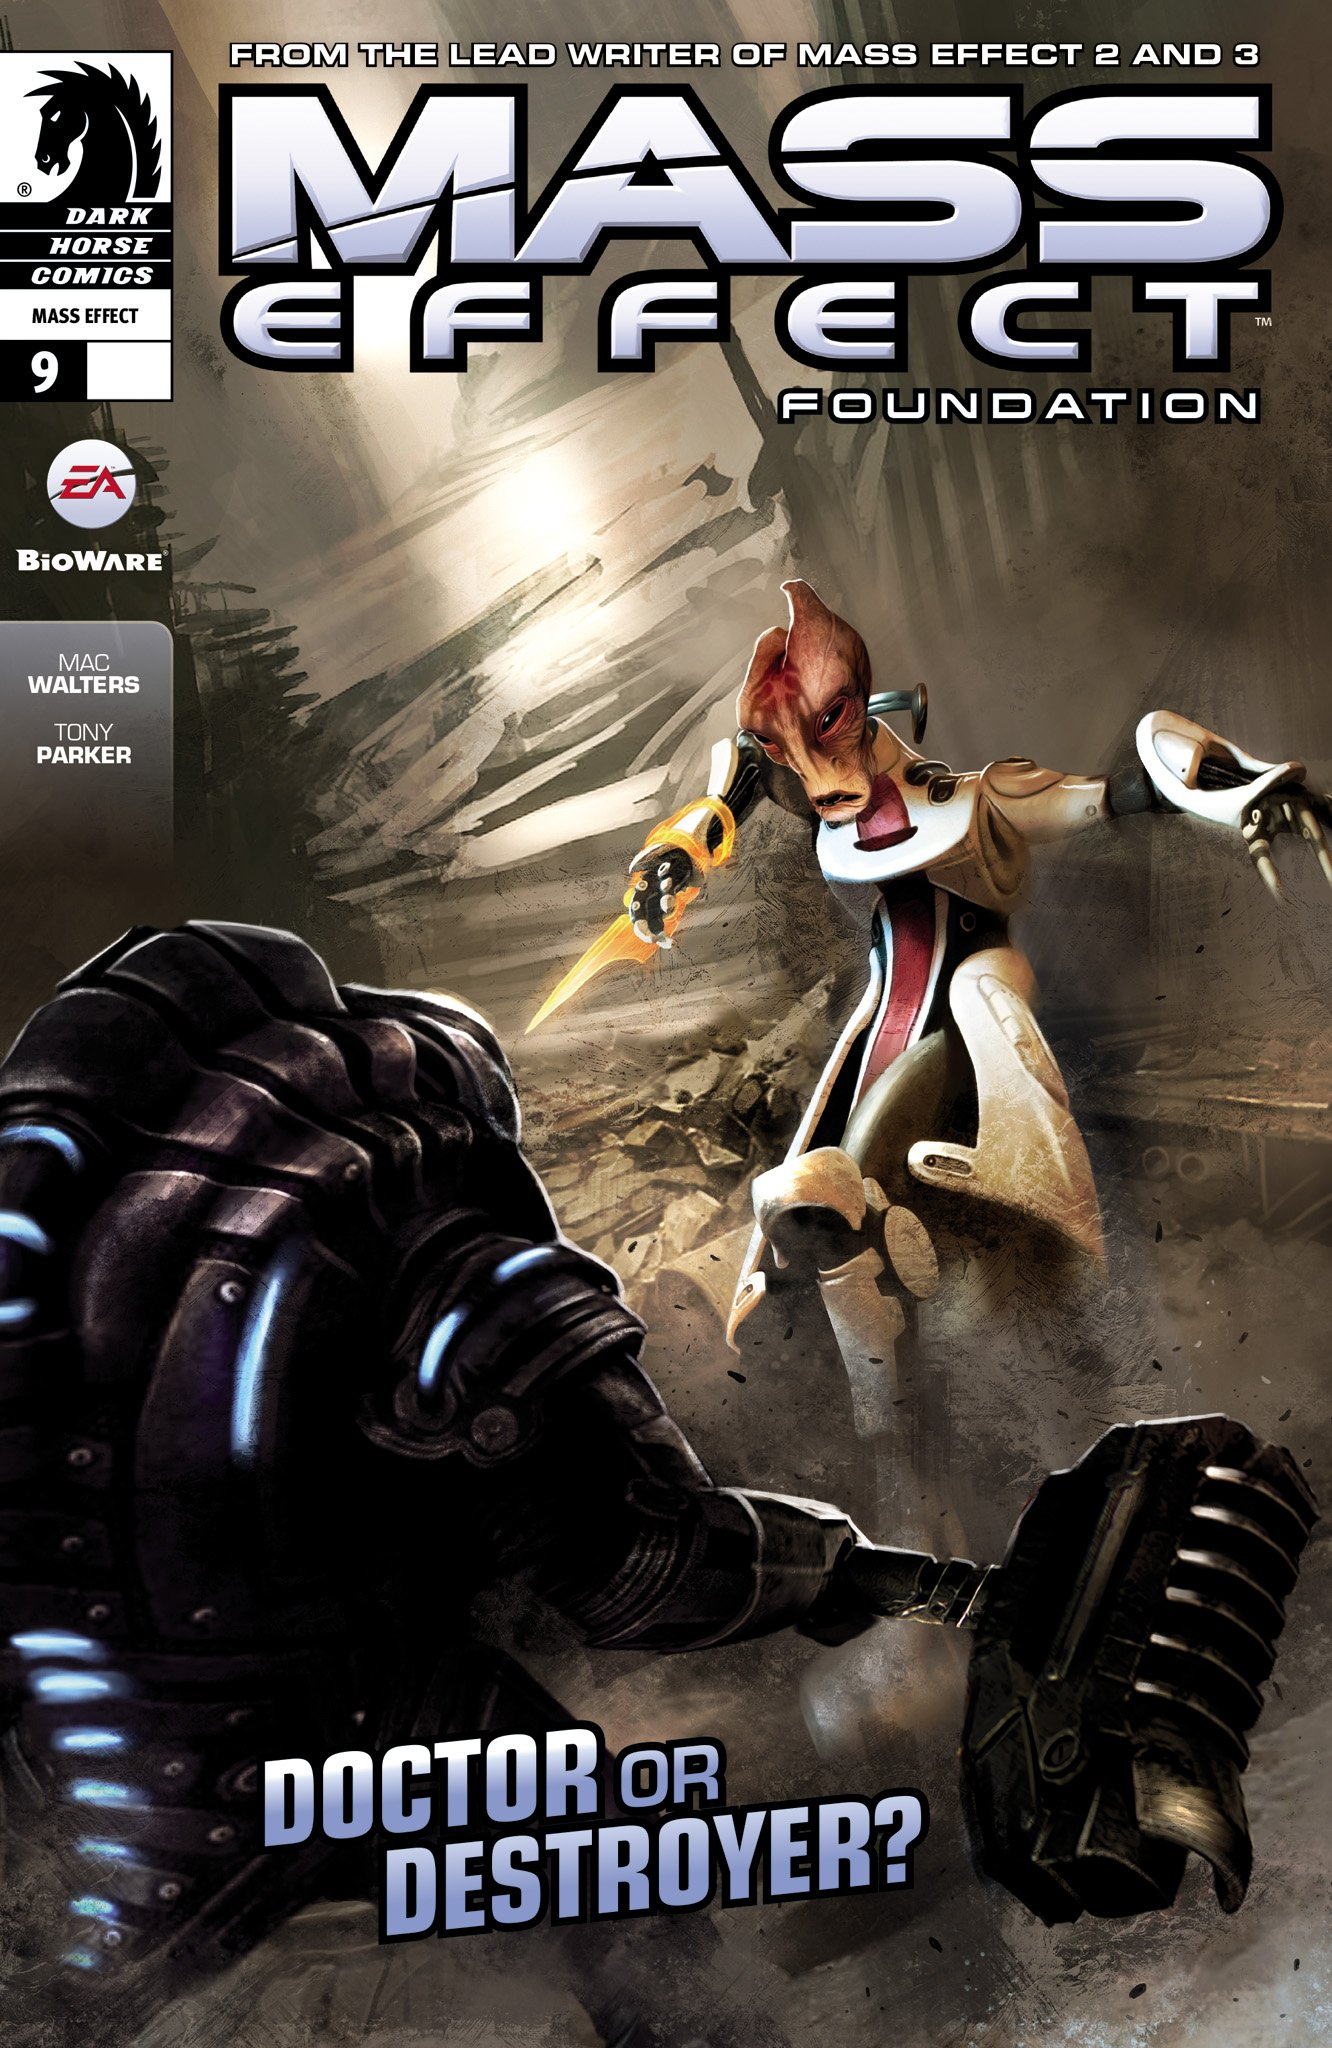 Mass Effect - Foundation 009 (March 2014)